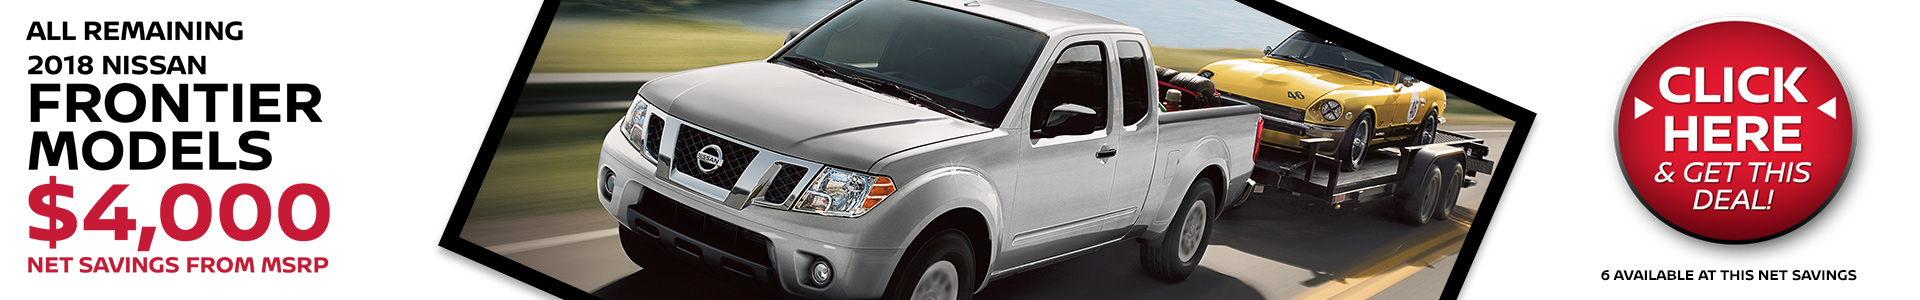 Mossy Nissan Chula Vista >> 3123 New and Used cars, trucks, and SUVs in Stock in San Diego, El Cajon, Escondido, La Mesa ...